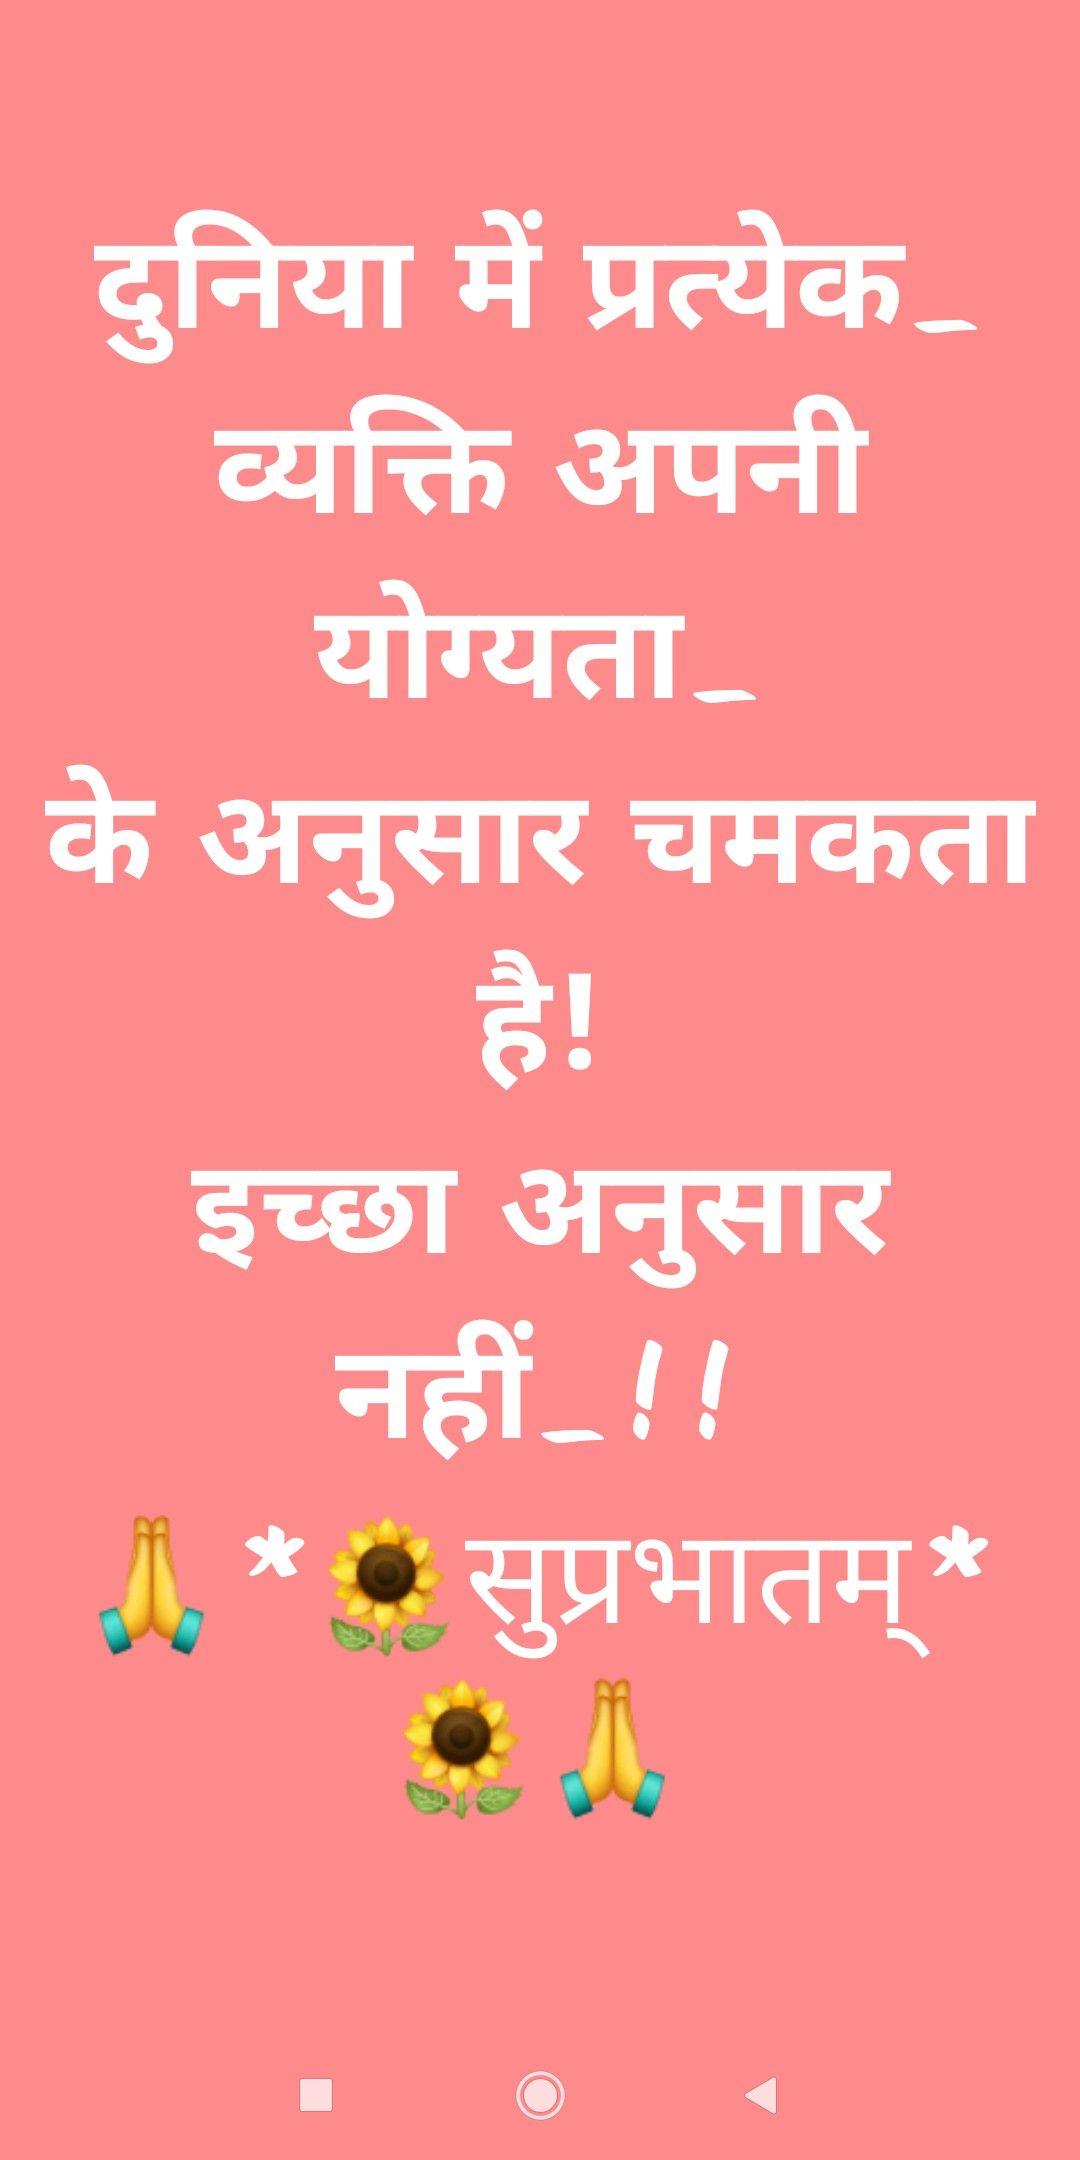 Pin by 🐿SHARMA🐿 on GOOD MORNING SHARMA | Zindagi quotes